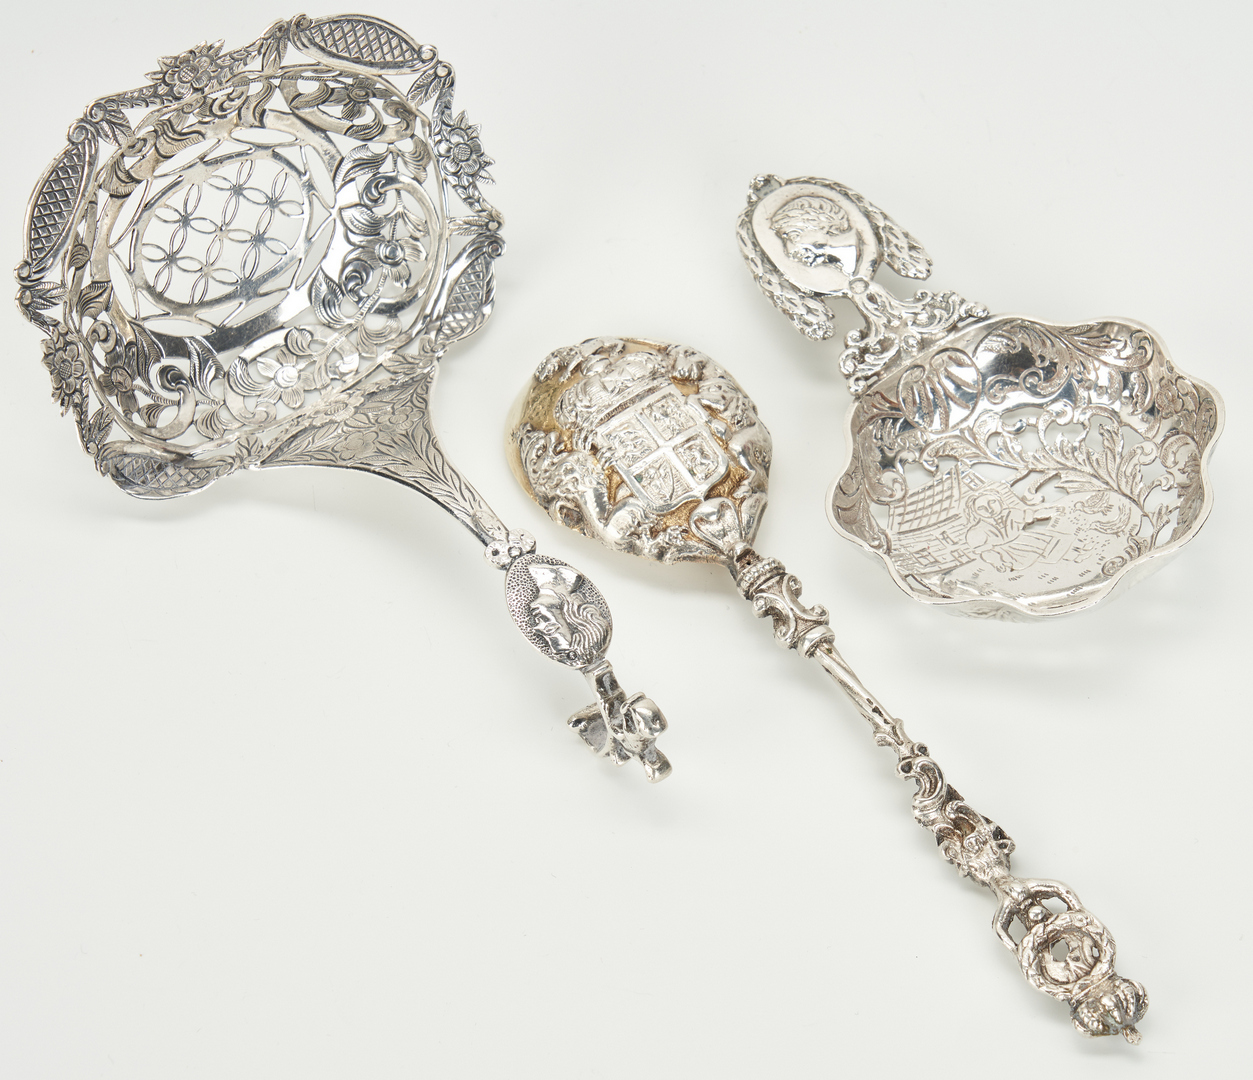 Lot 447: Silver Novelties inc. Tiffany Floral Demitasse